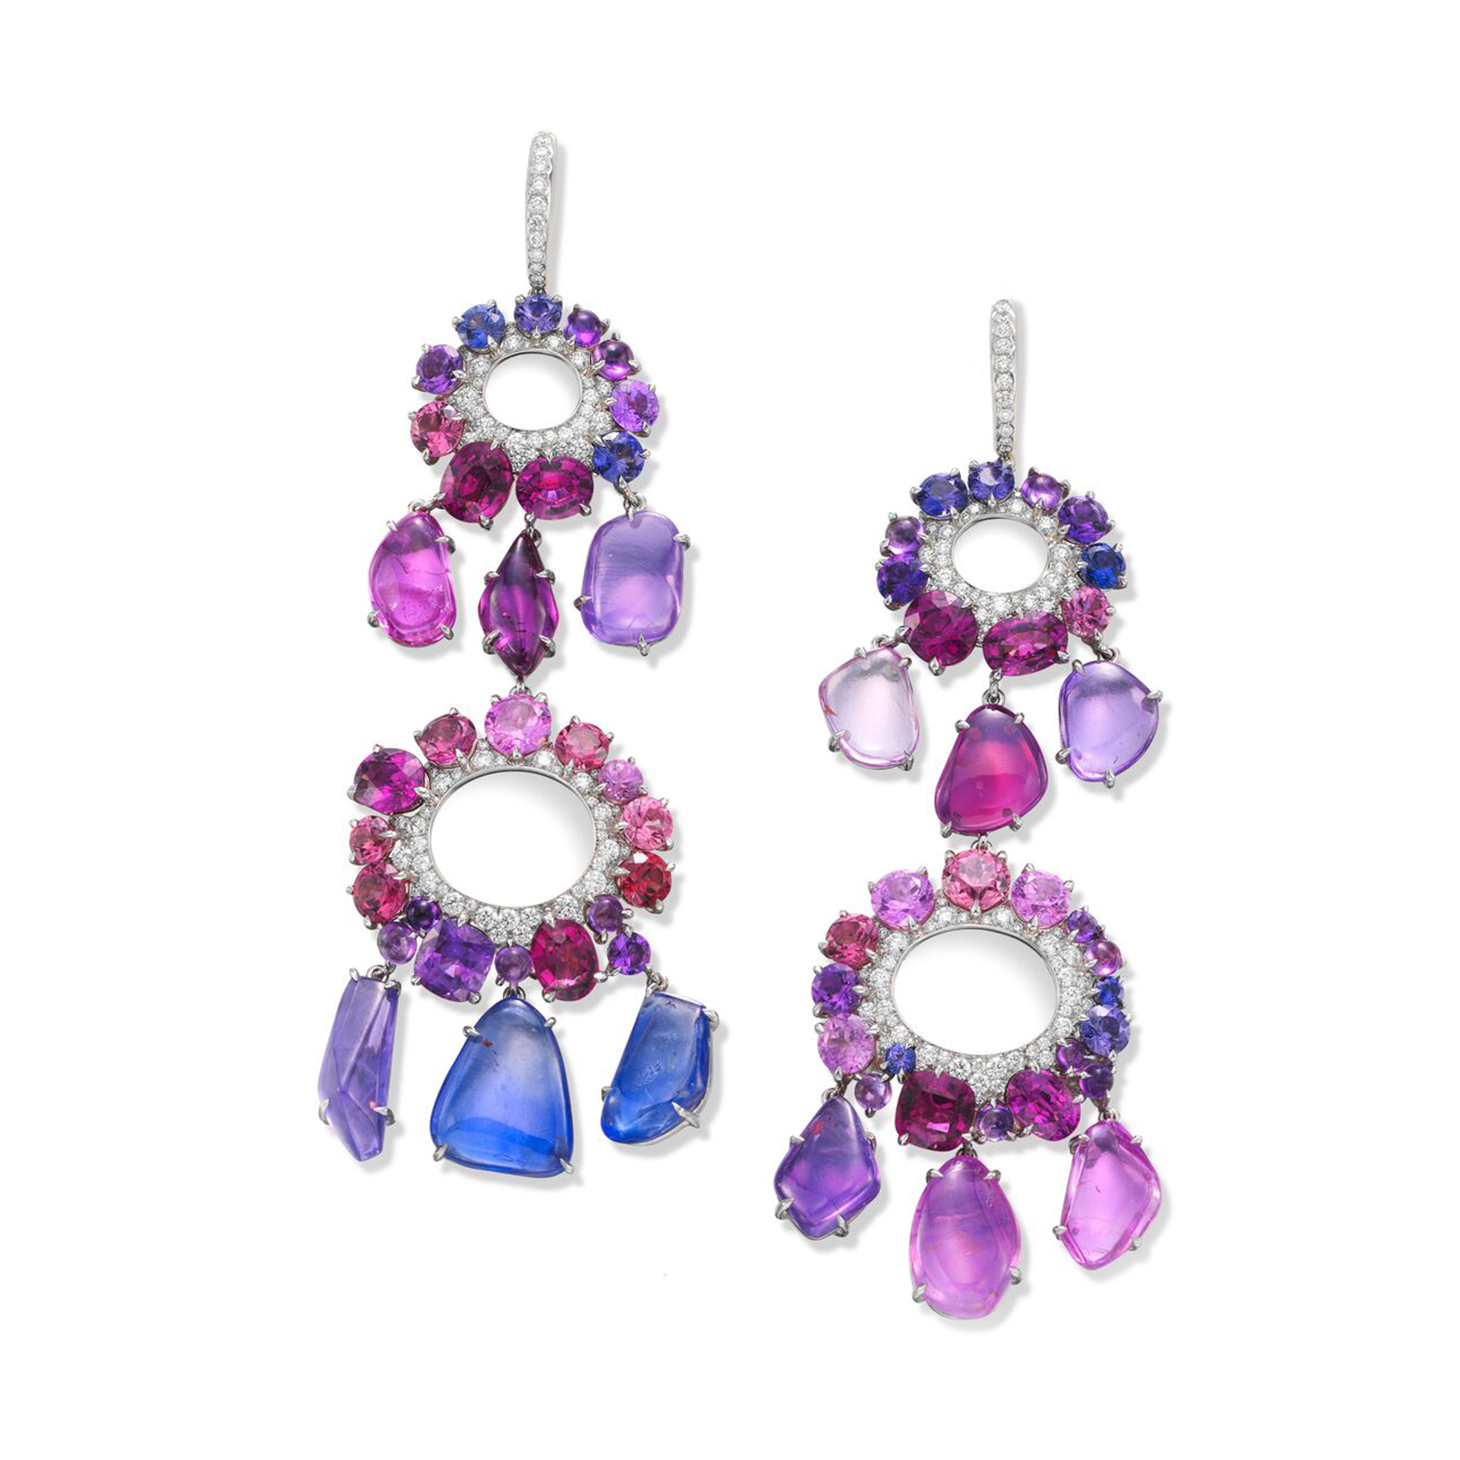 A Pair of Sapphire, Pink Spinel, Garnet, Amethyst and Diamond Ear Pendants, by SABBA